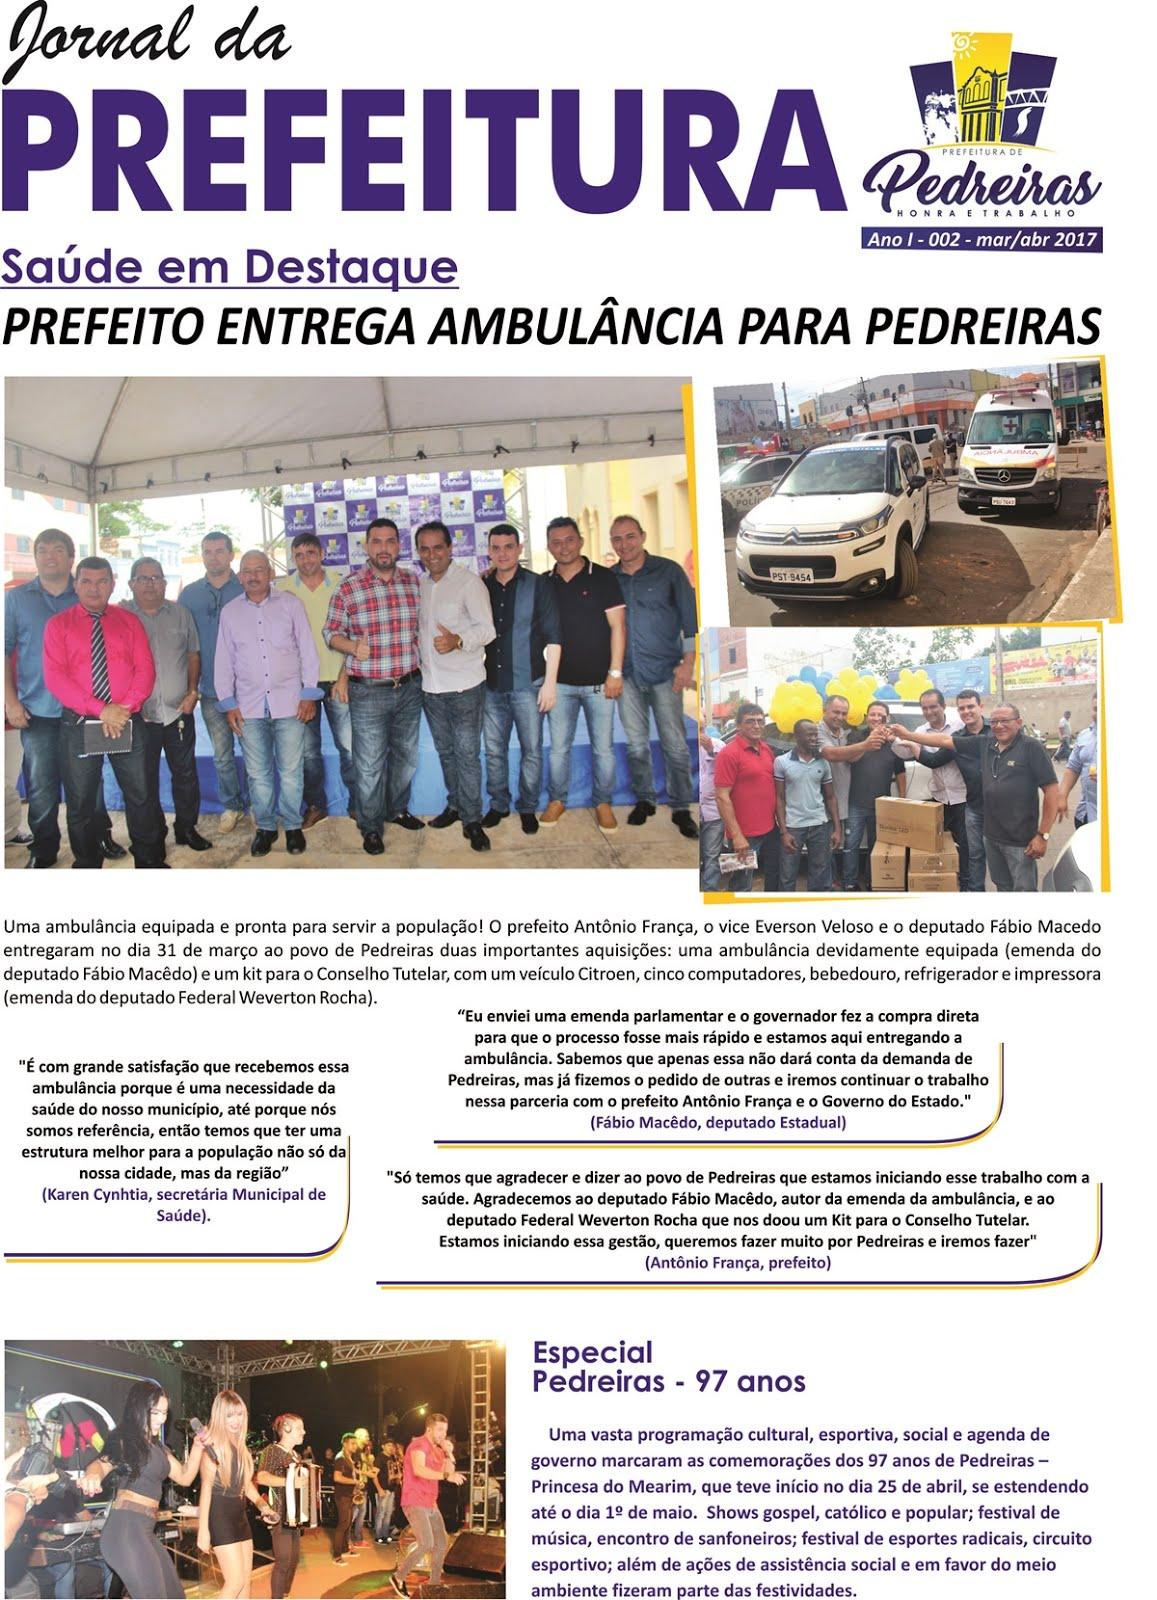 JORNAL DA PREFEITURA 002